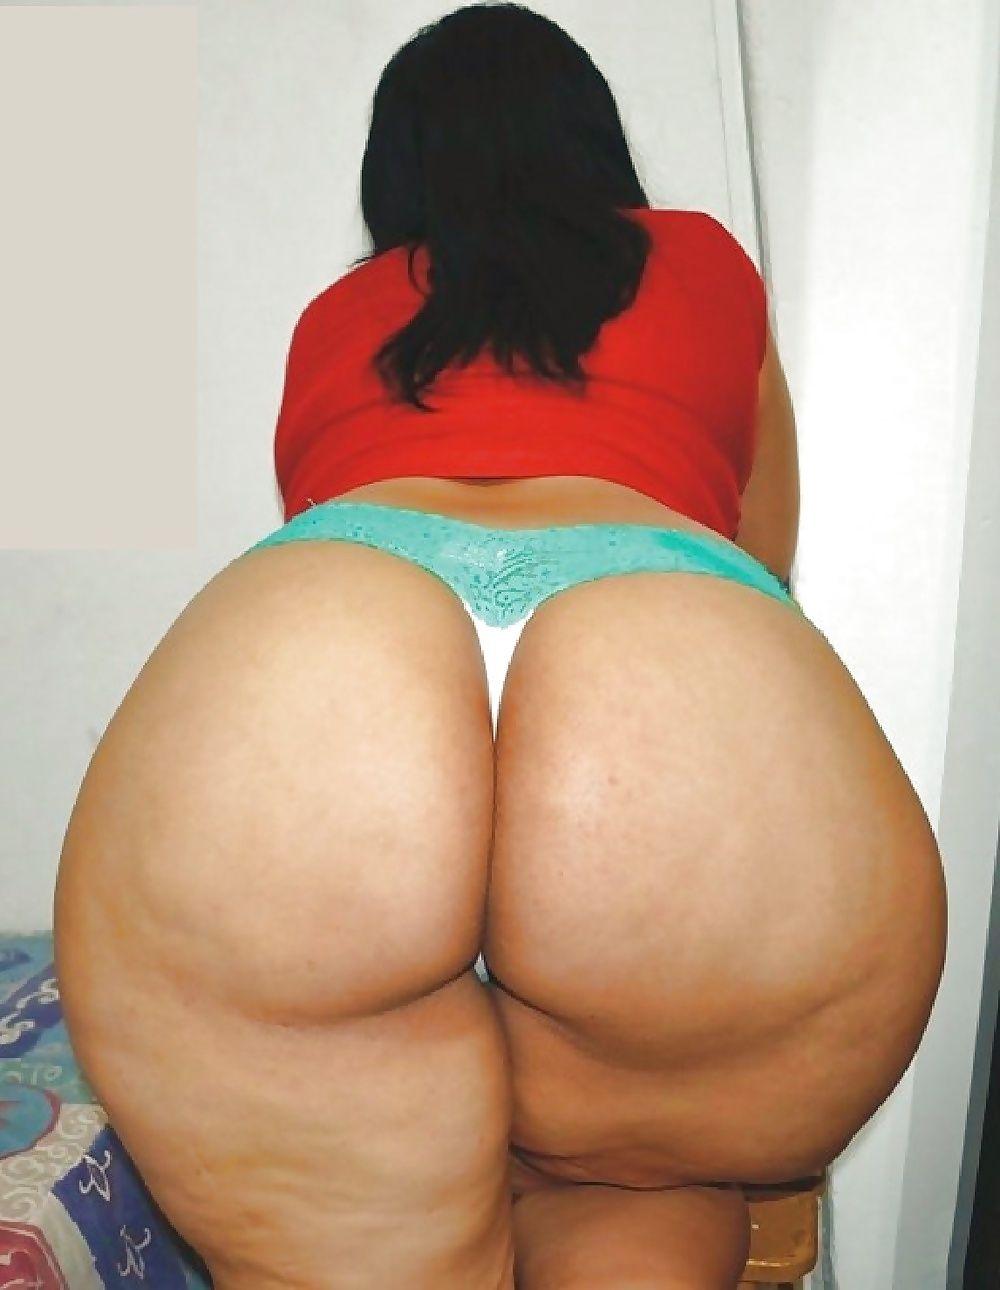 pinchris williams on big booty nayara   pinterest   big, curves